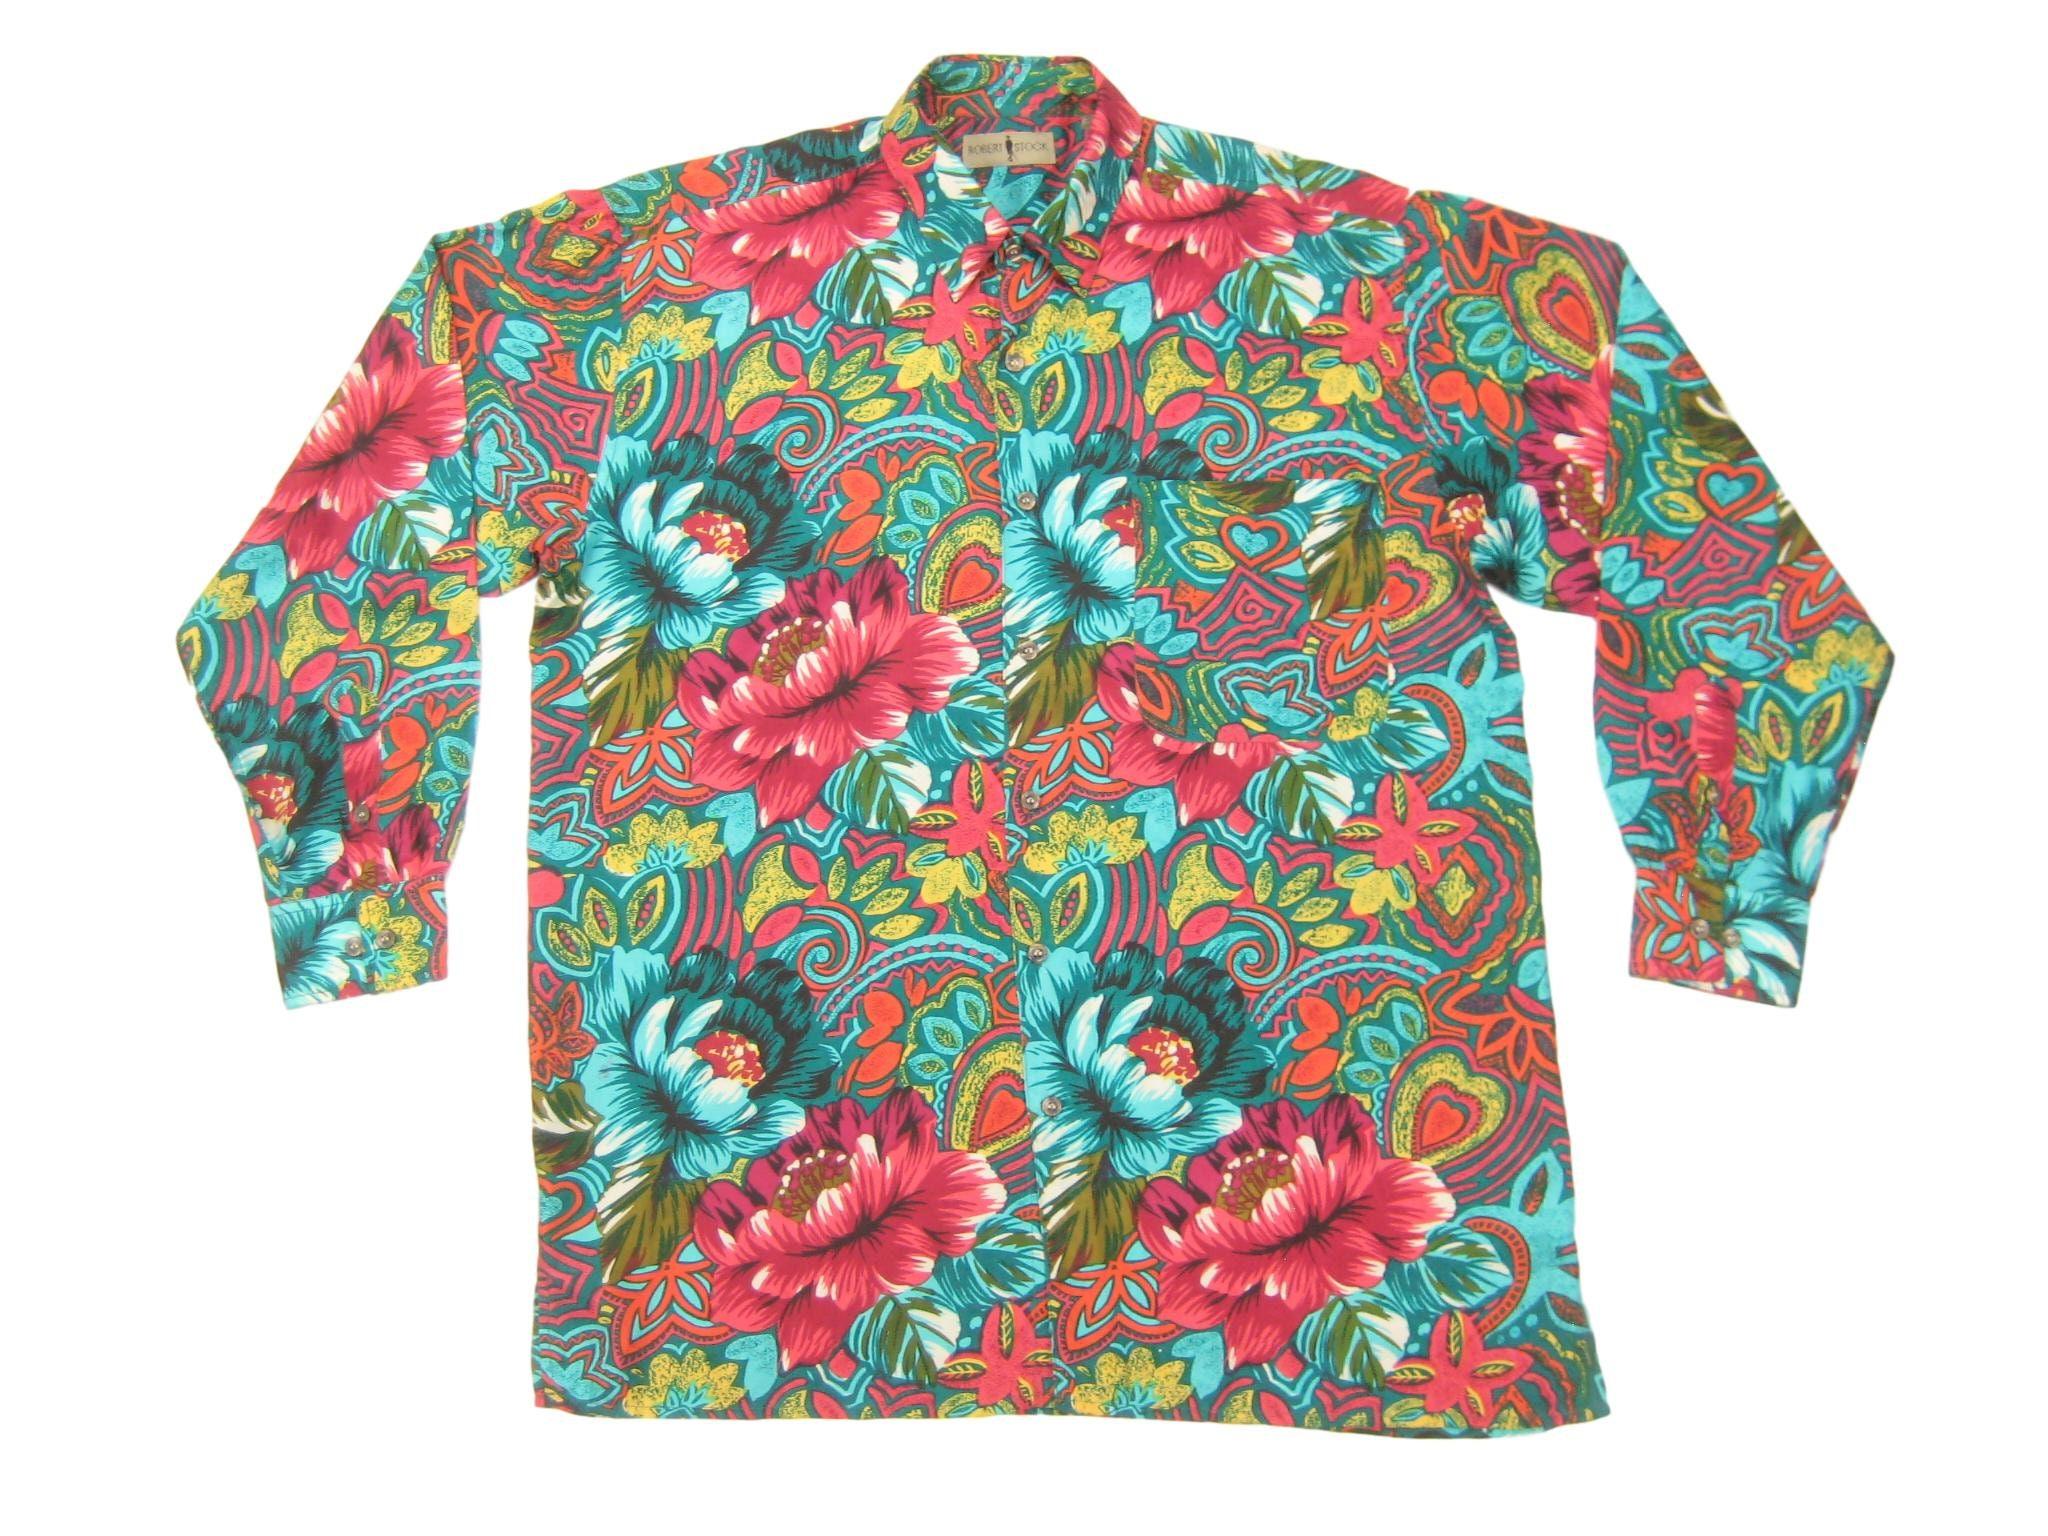 1990s Robert Stock Silk Print Shirt Vintage Retro 90s Floral Etsy